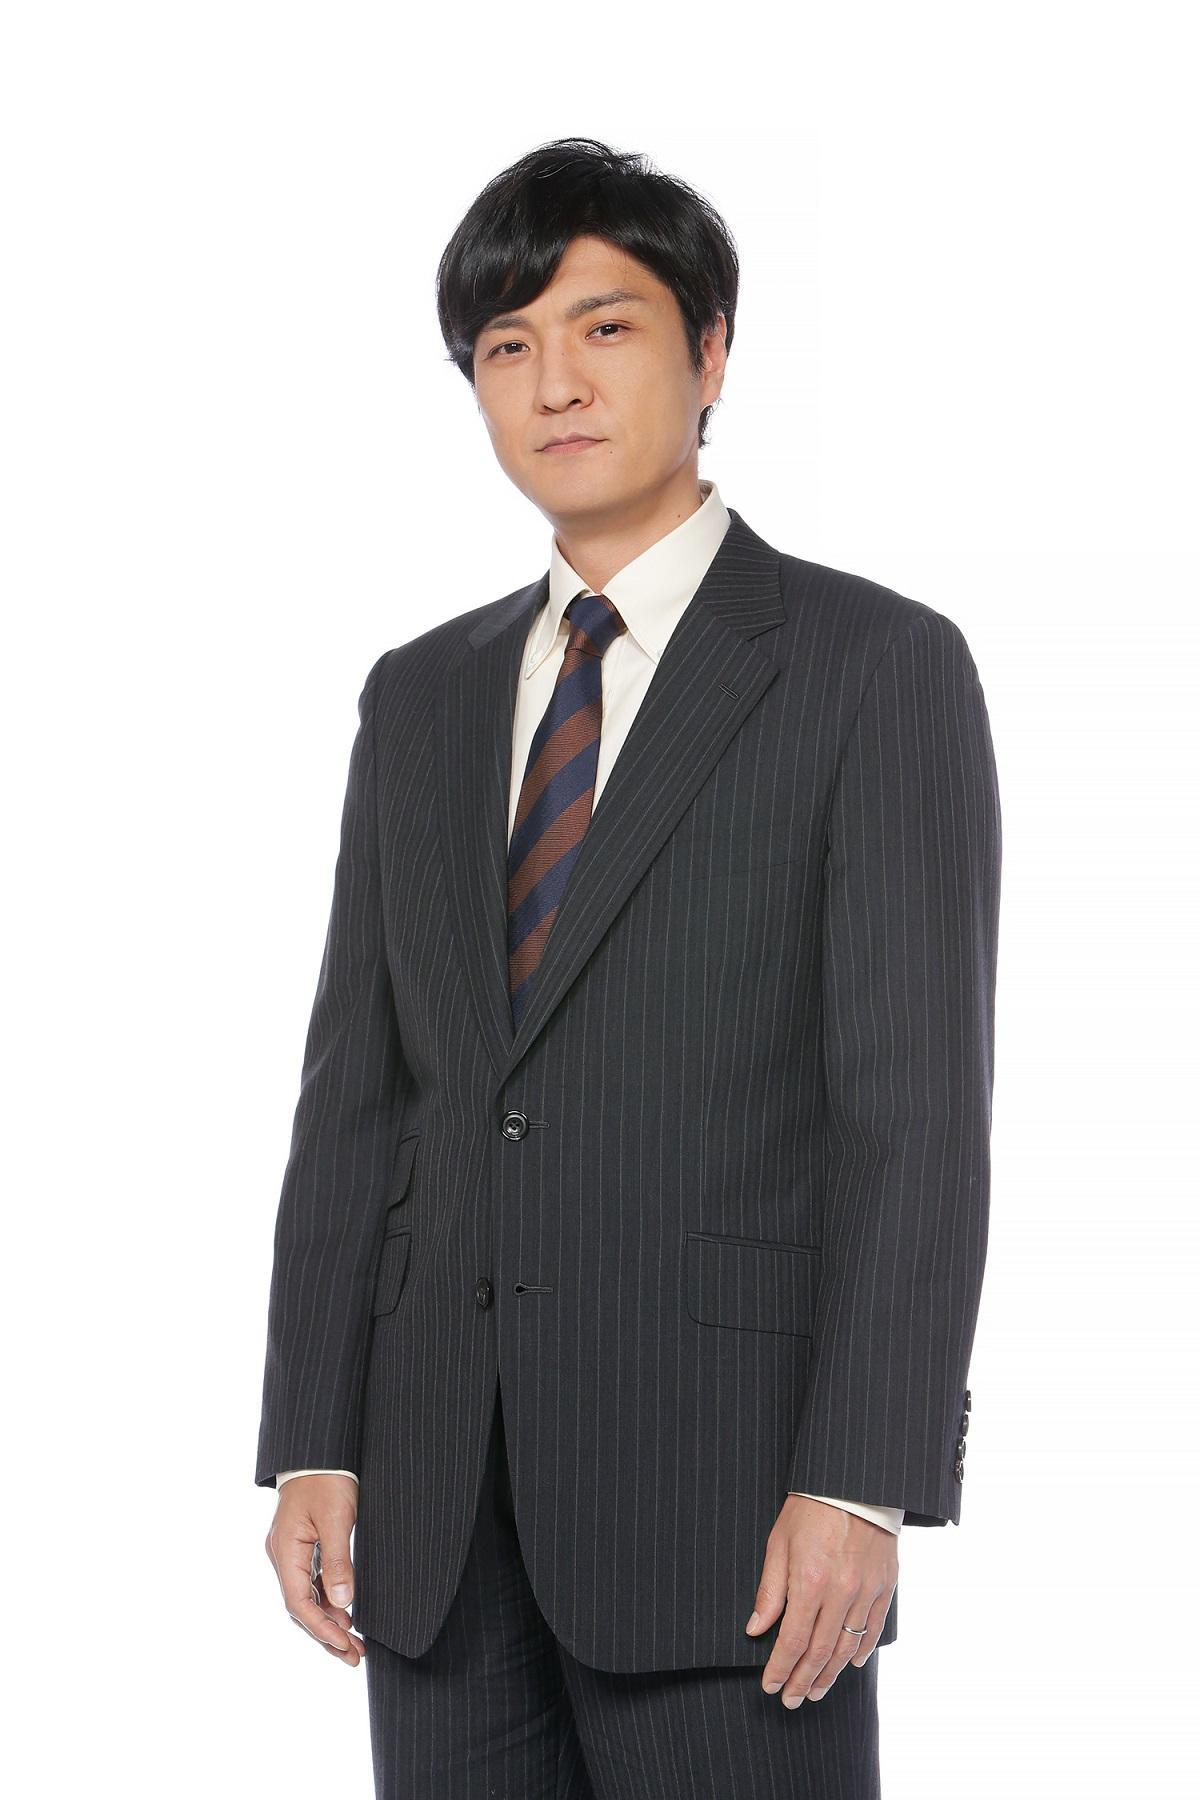 20210702_ukiwa_03.jpg